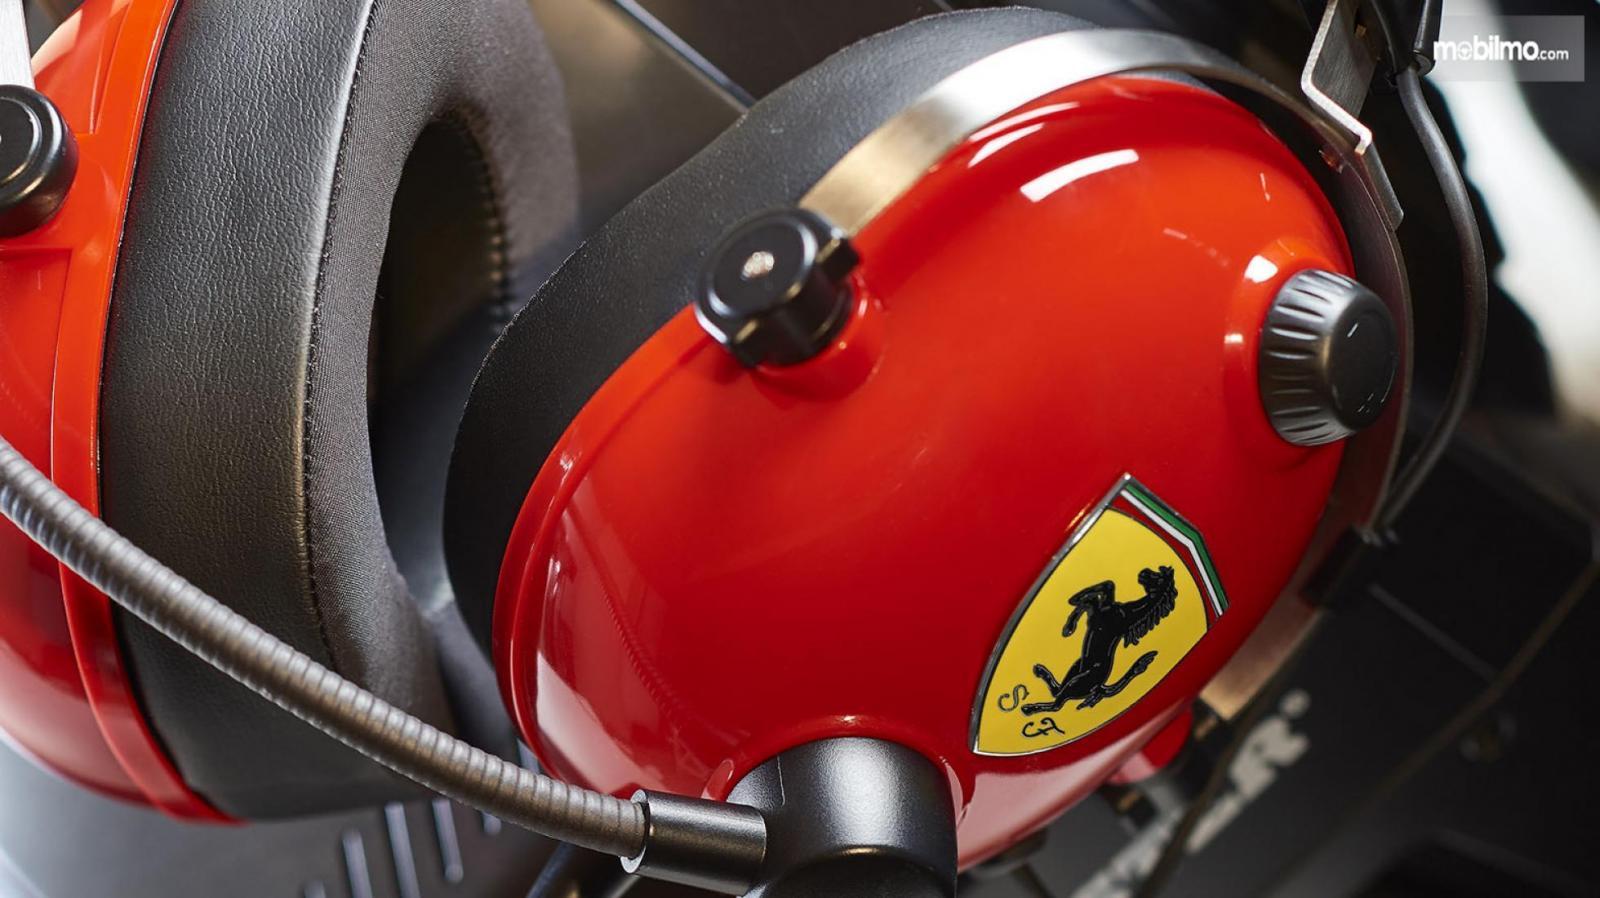 Gambar desain headset Thrustmaster edisi Ferrari